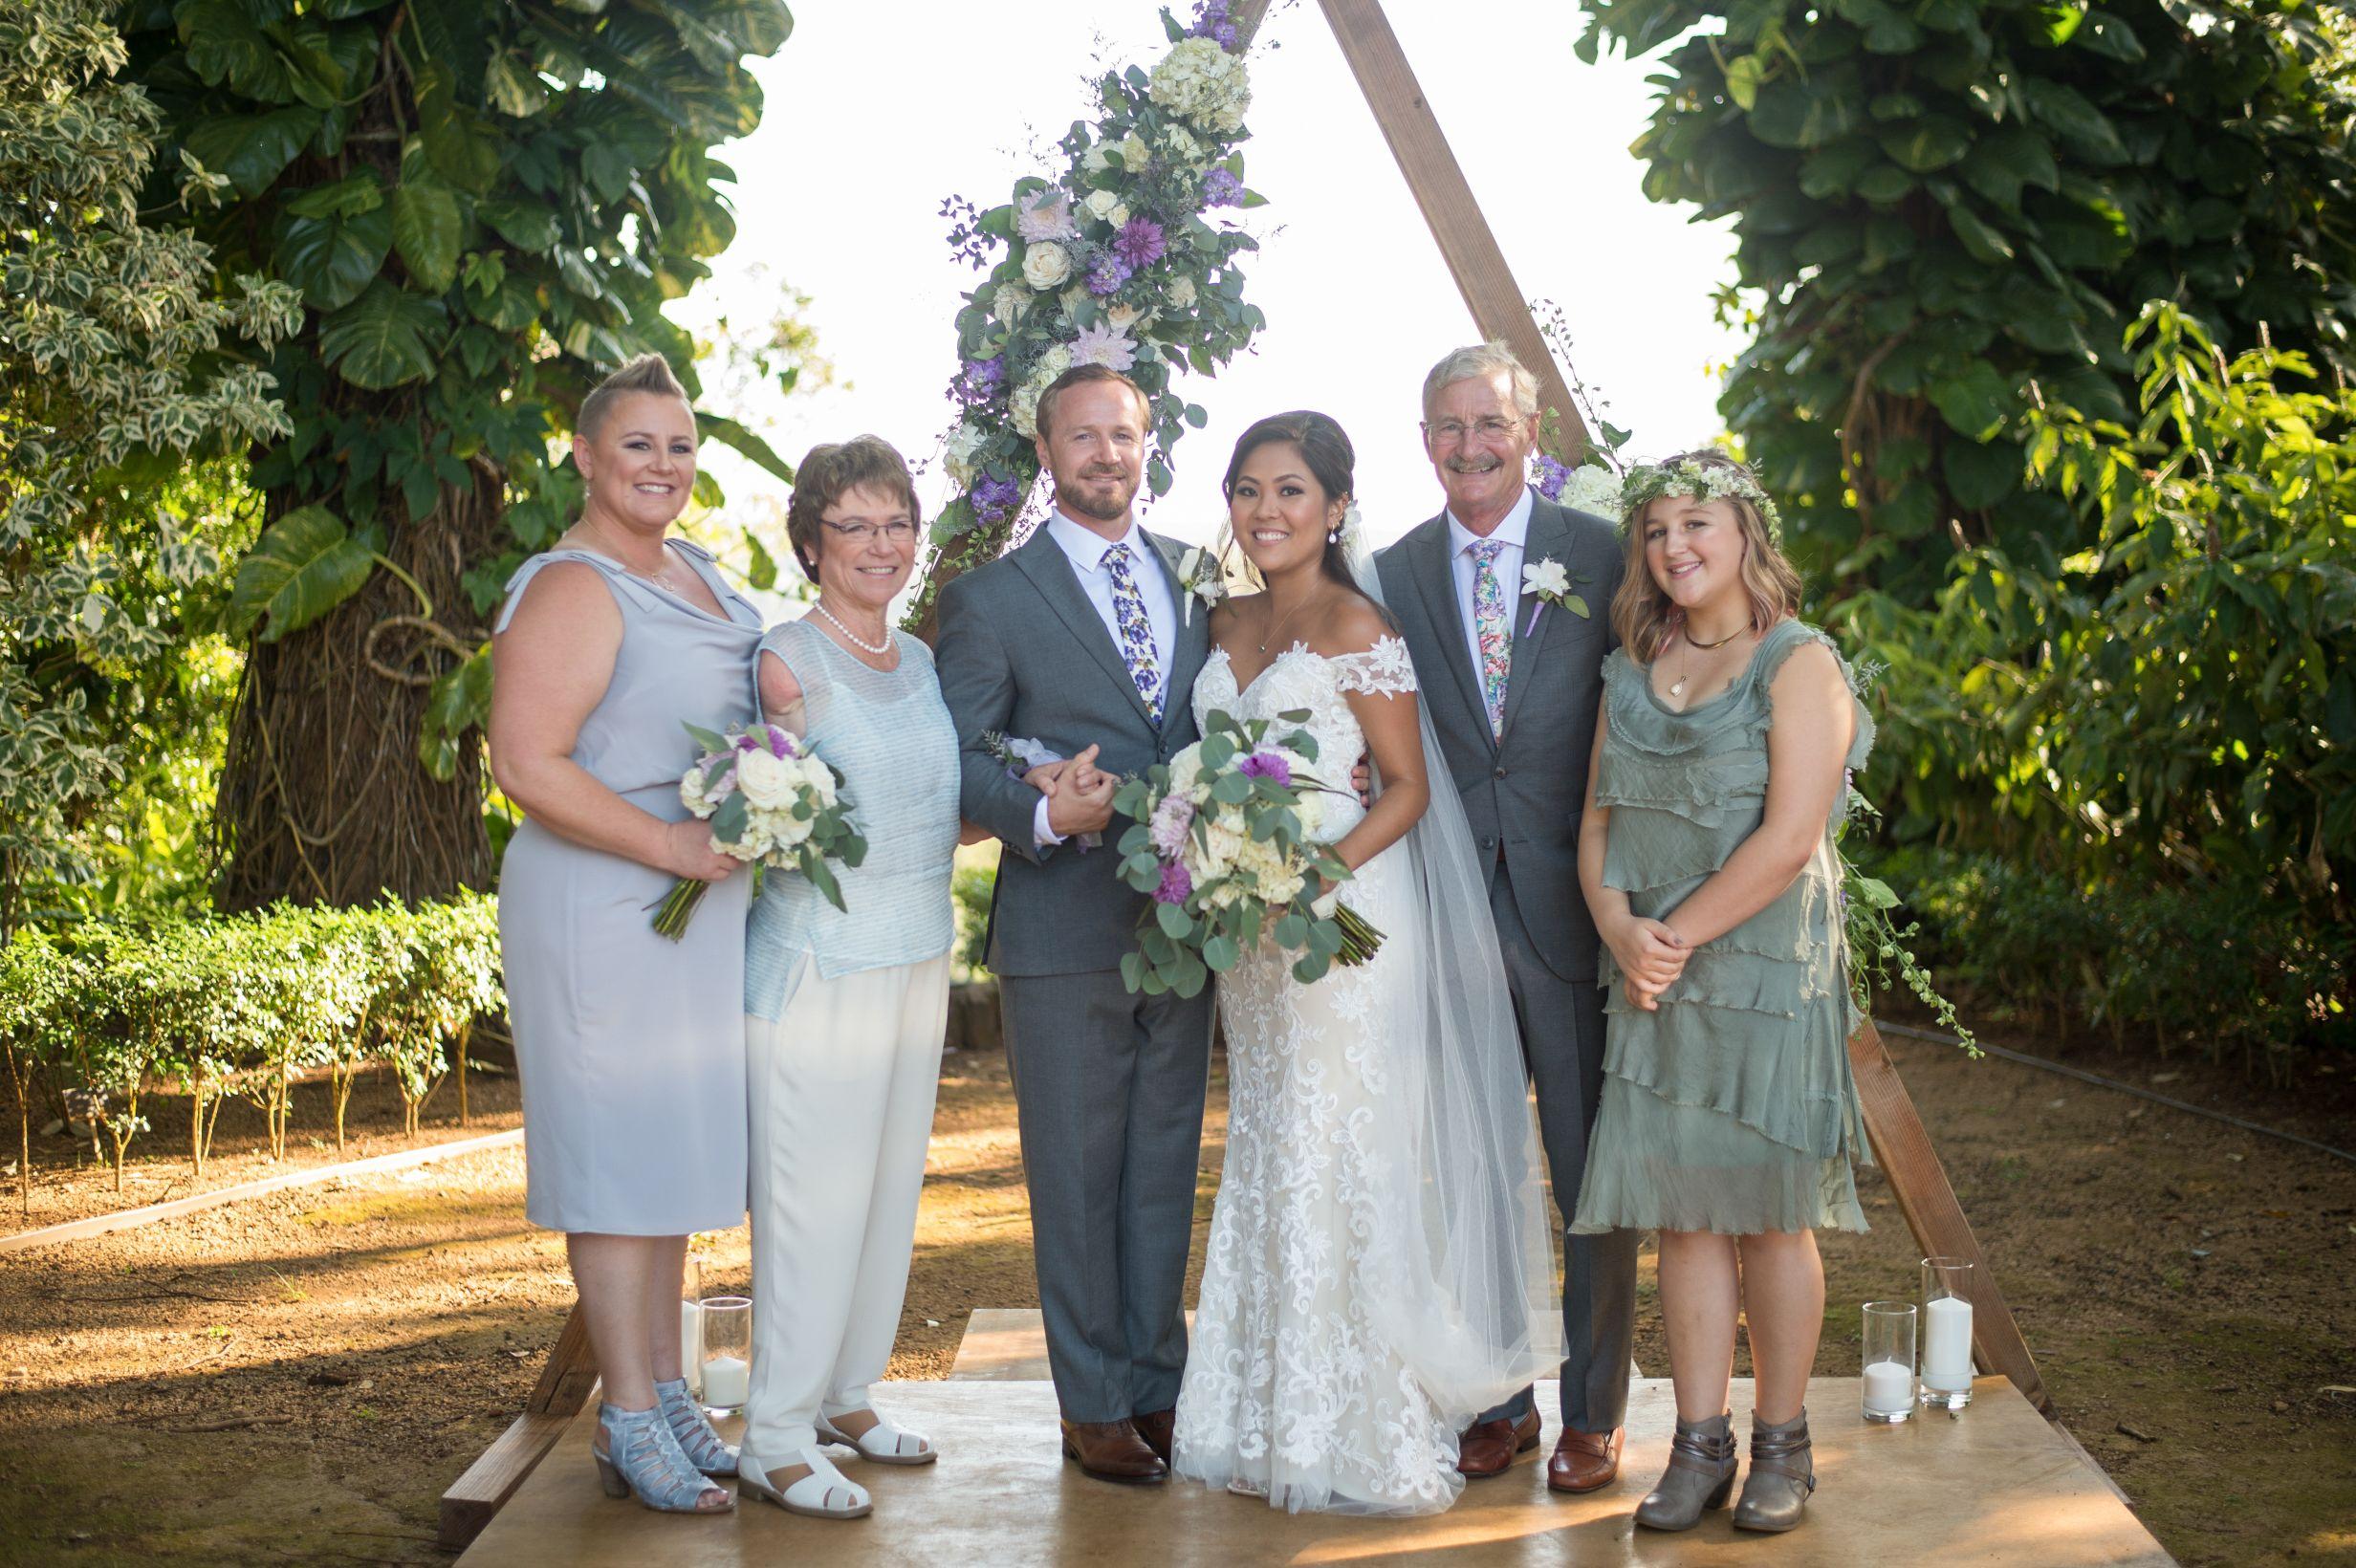 October 26, 2019: Linda Olson's son wedding